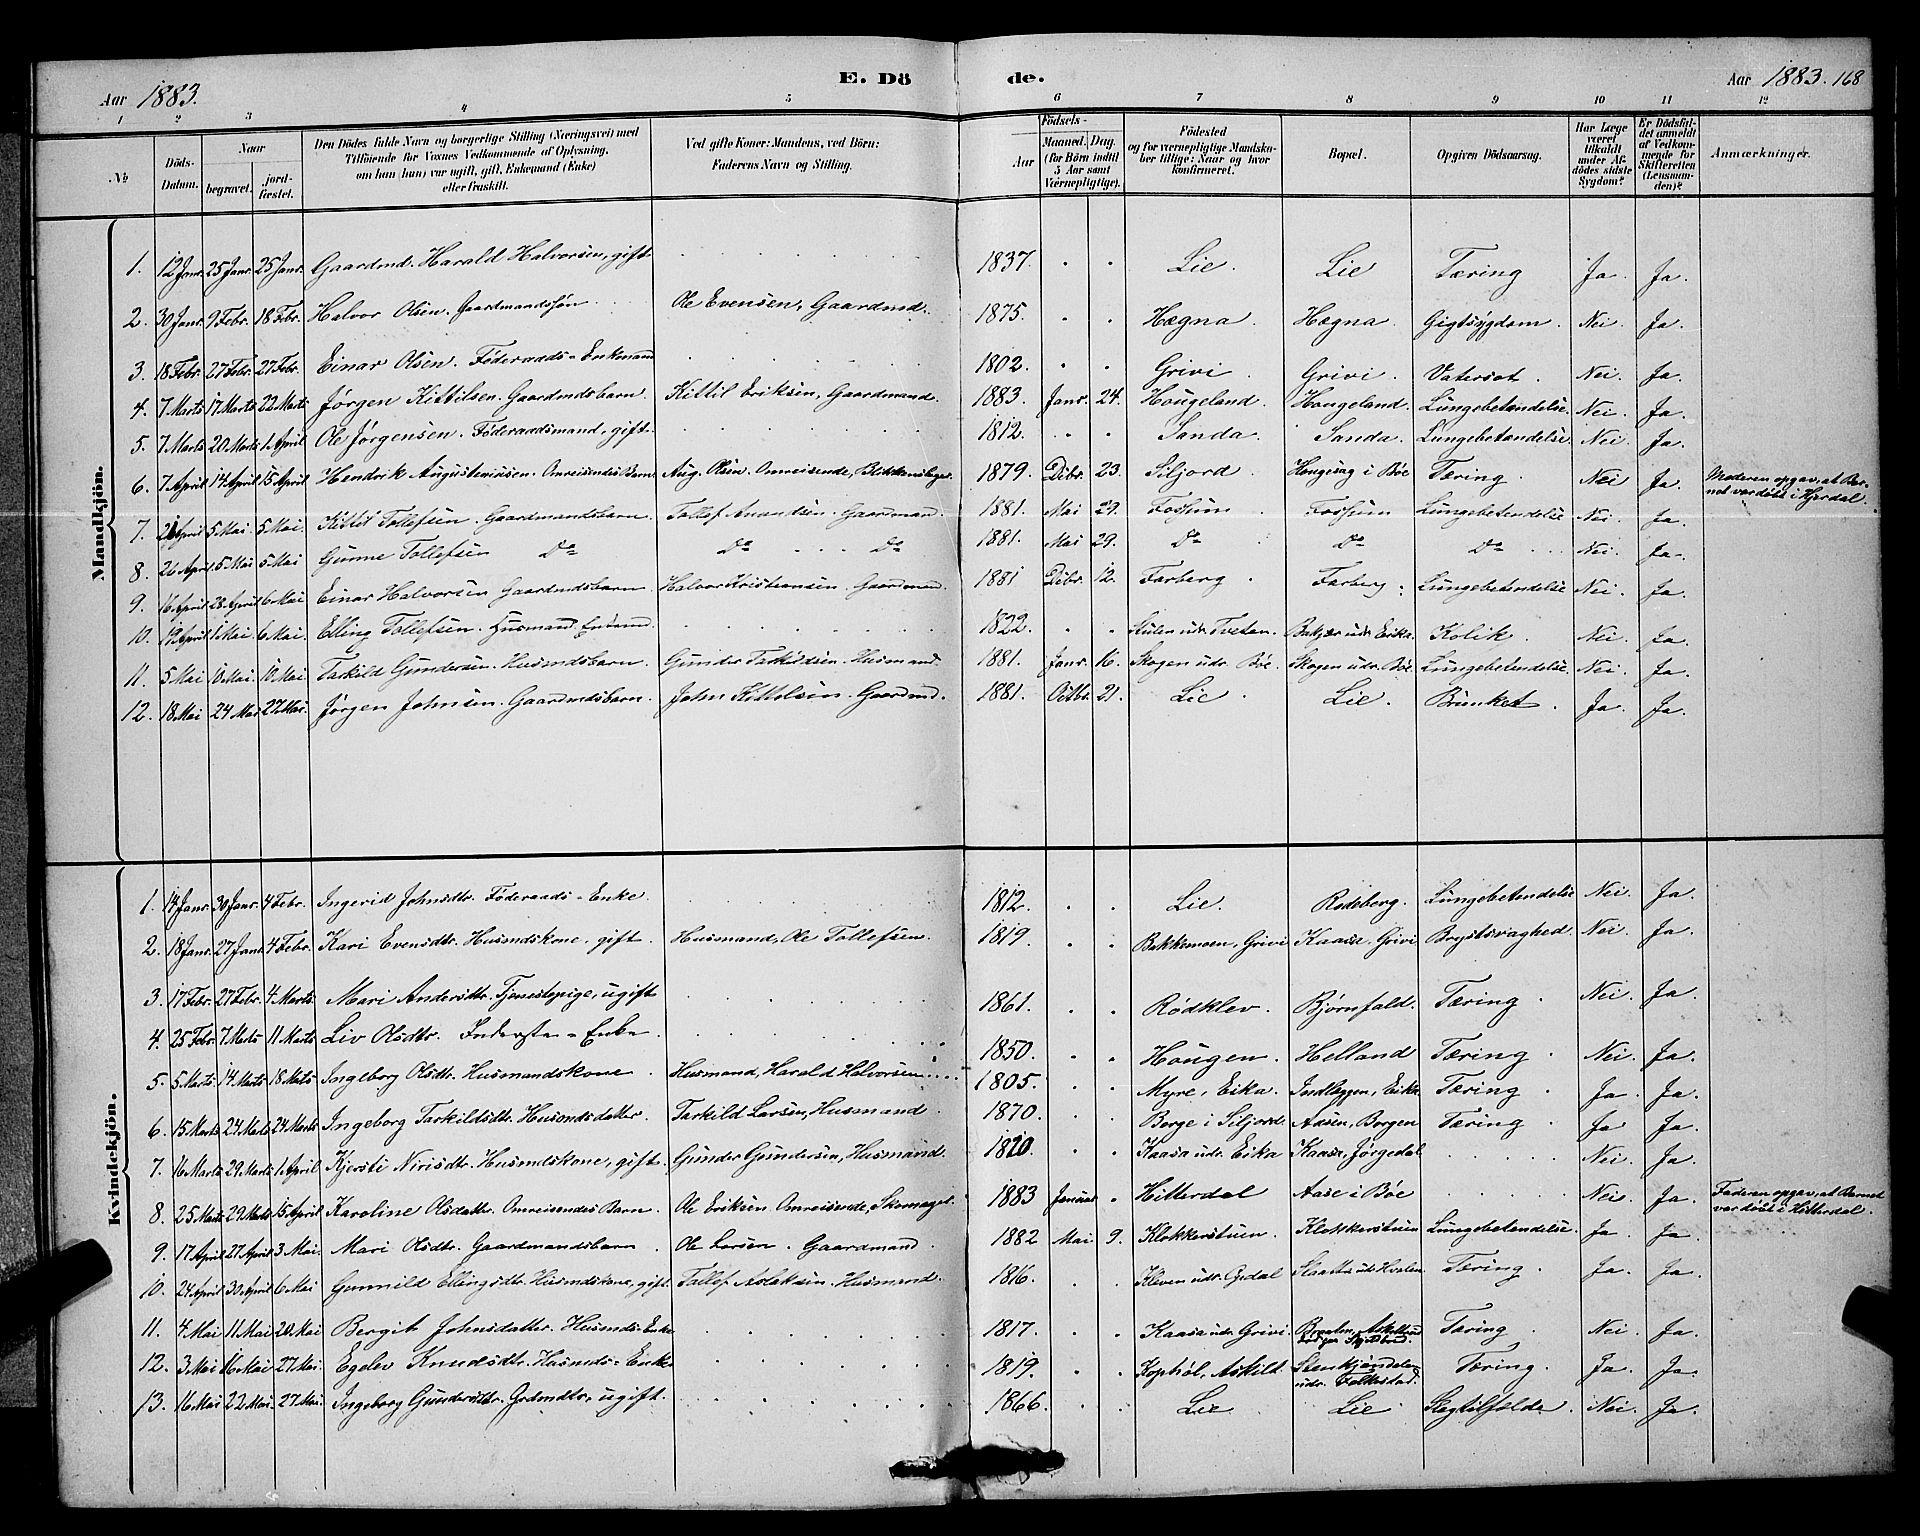 SAKO, Bø kirkebøker, G/Ga/L0005: Klokkerbok nr. 5, 1883-1897, s. 168